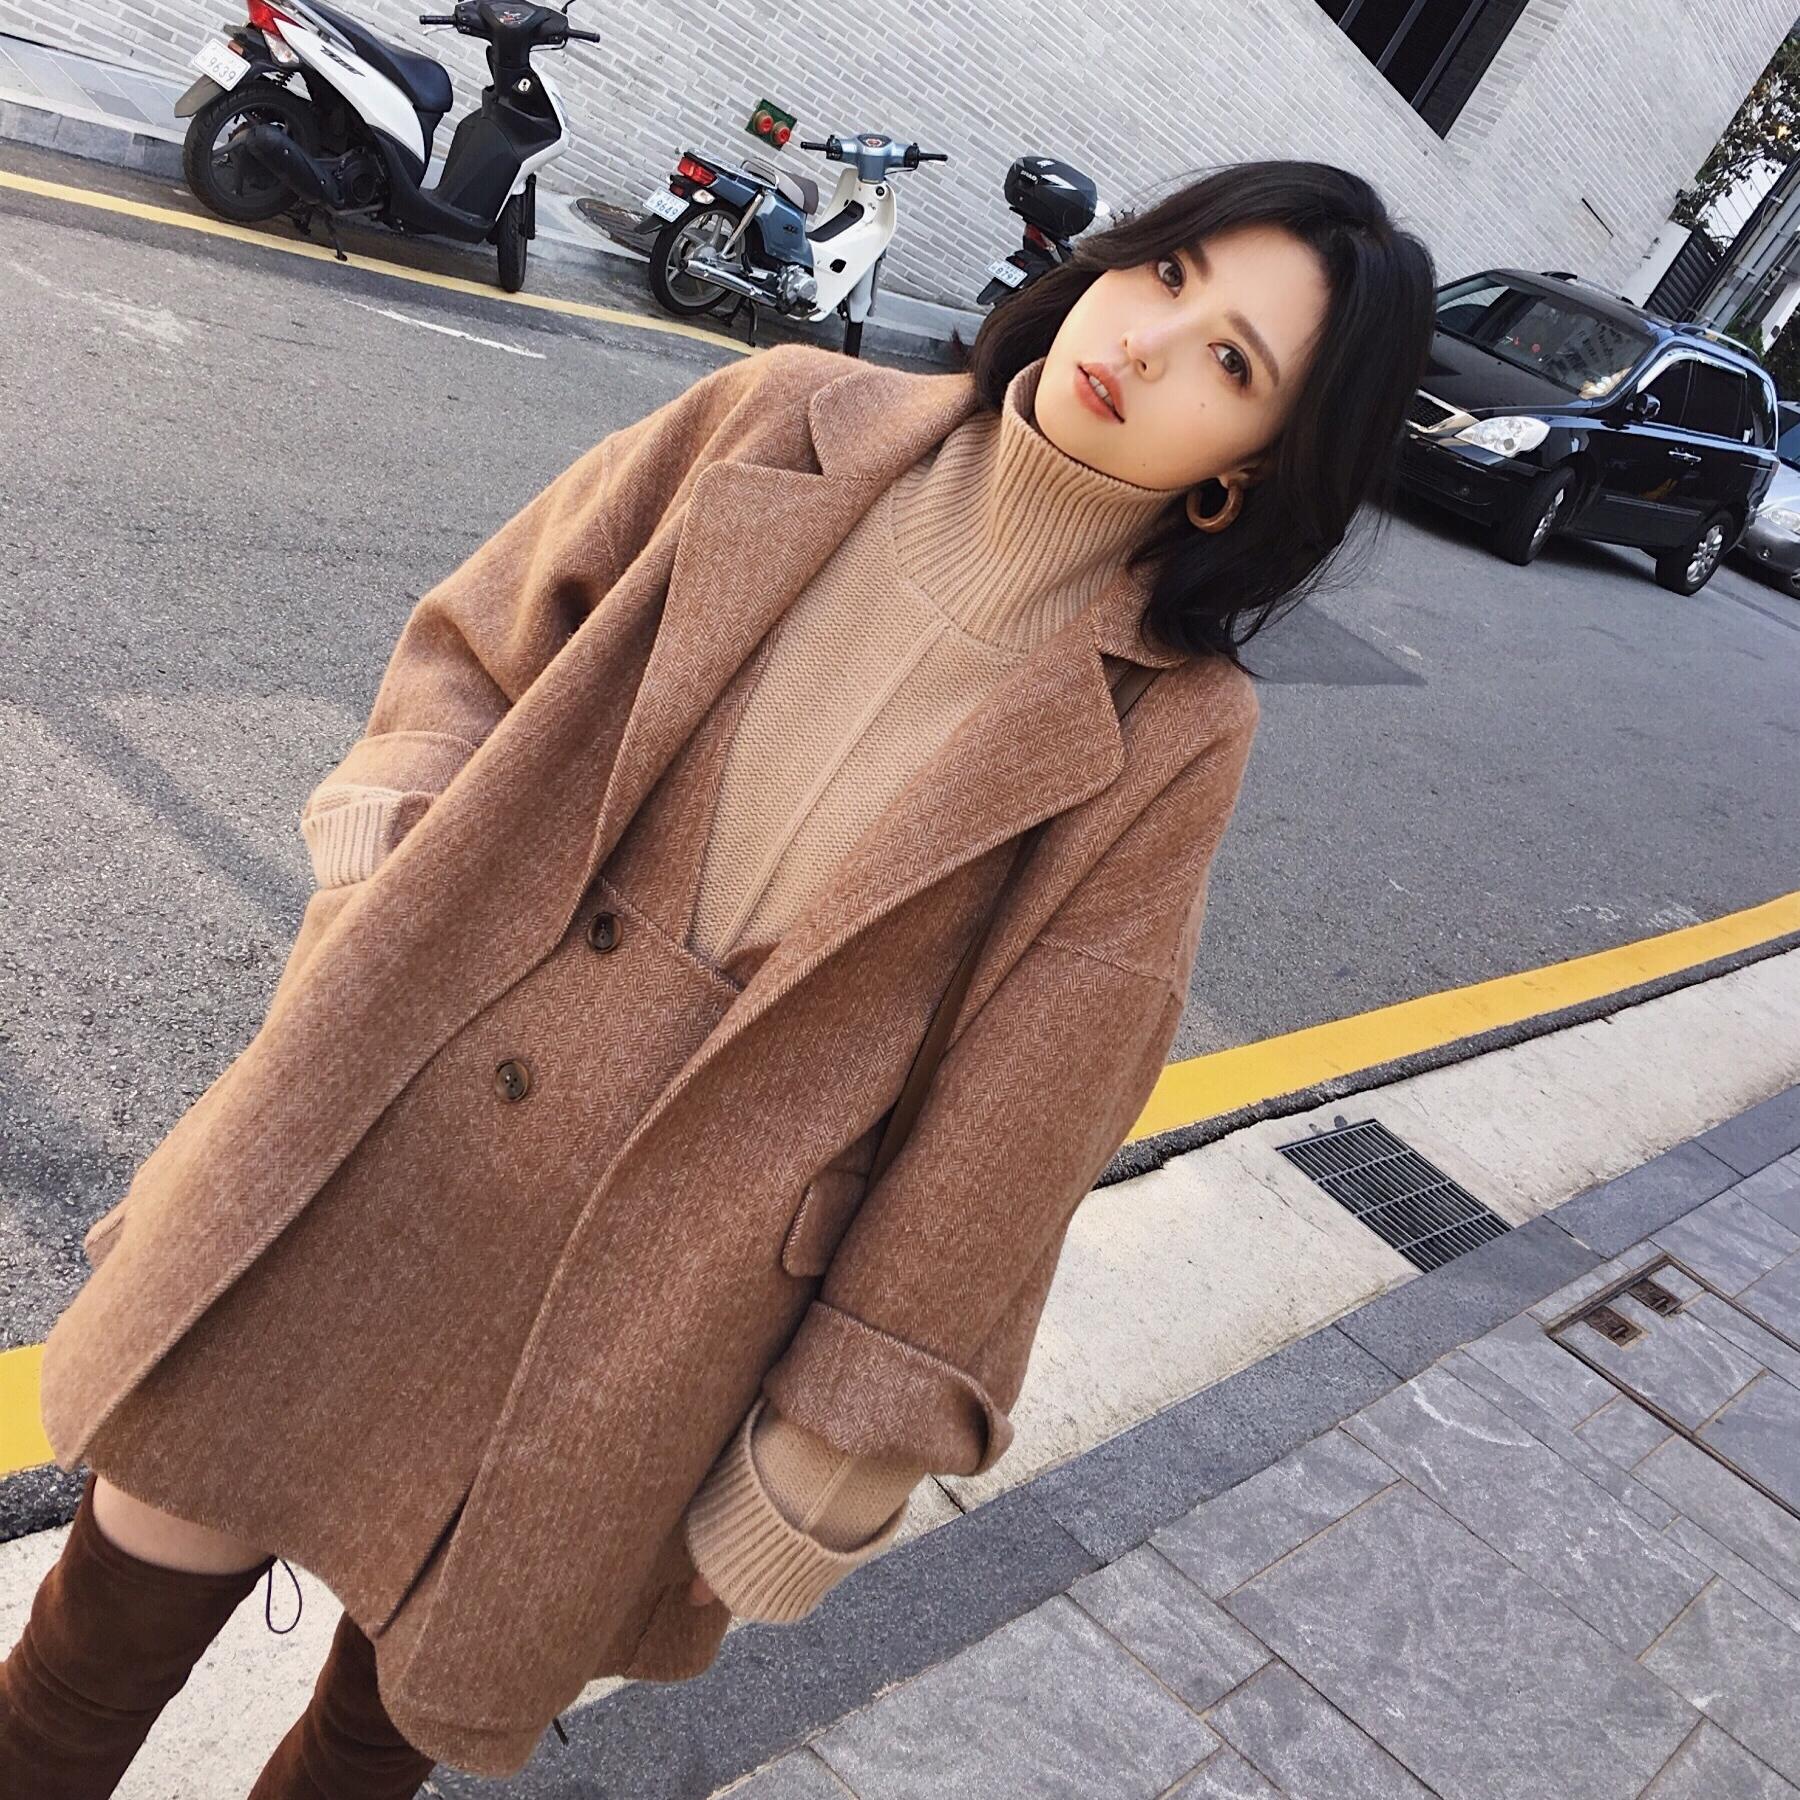 ◆ANNA◆2017冬装新款羊毛羊驼绒呢子大衣双面中长款外套女装套装